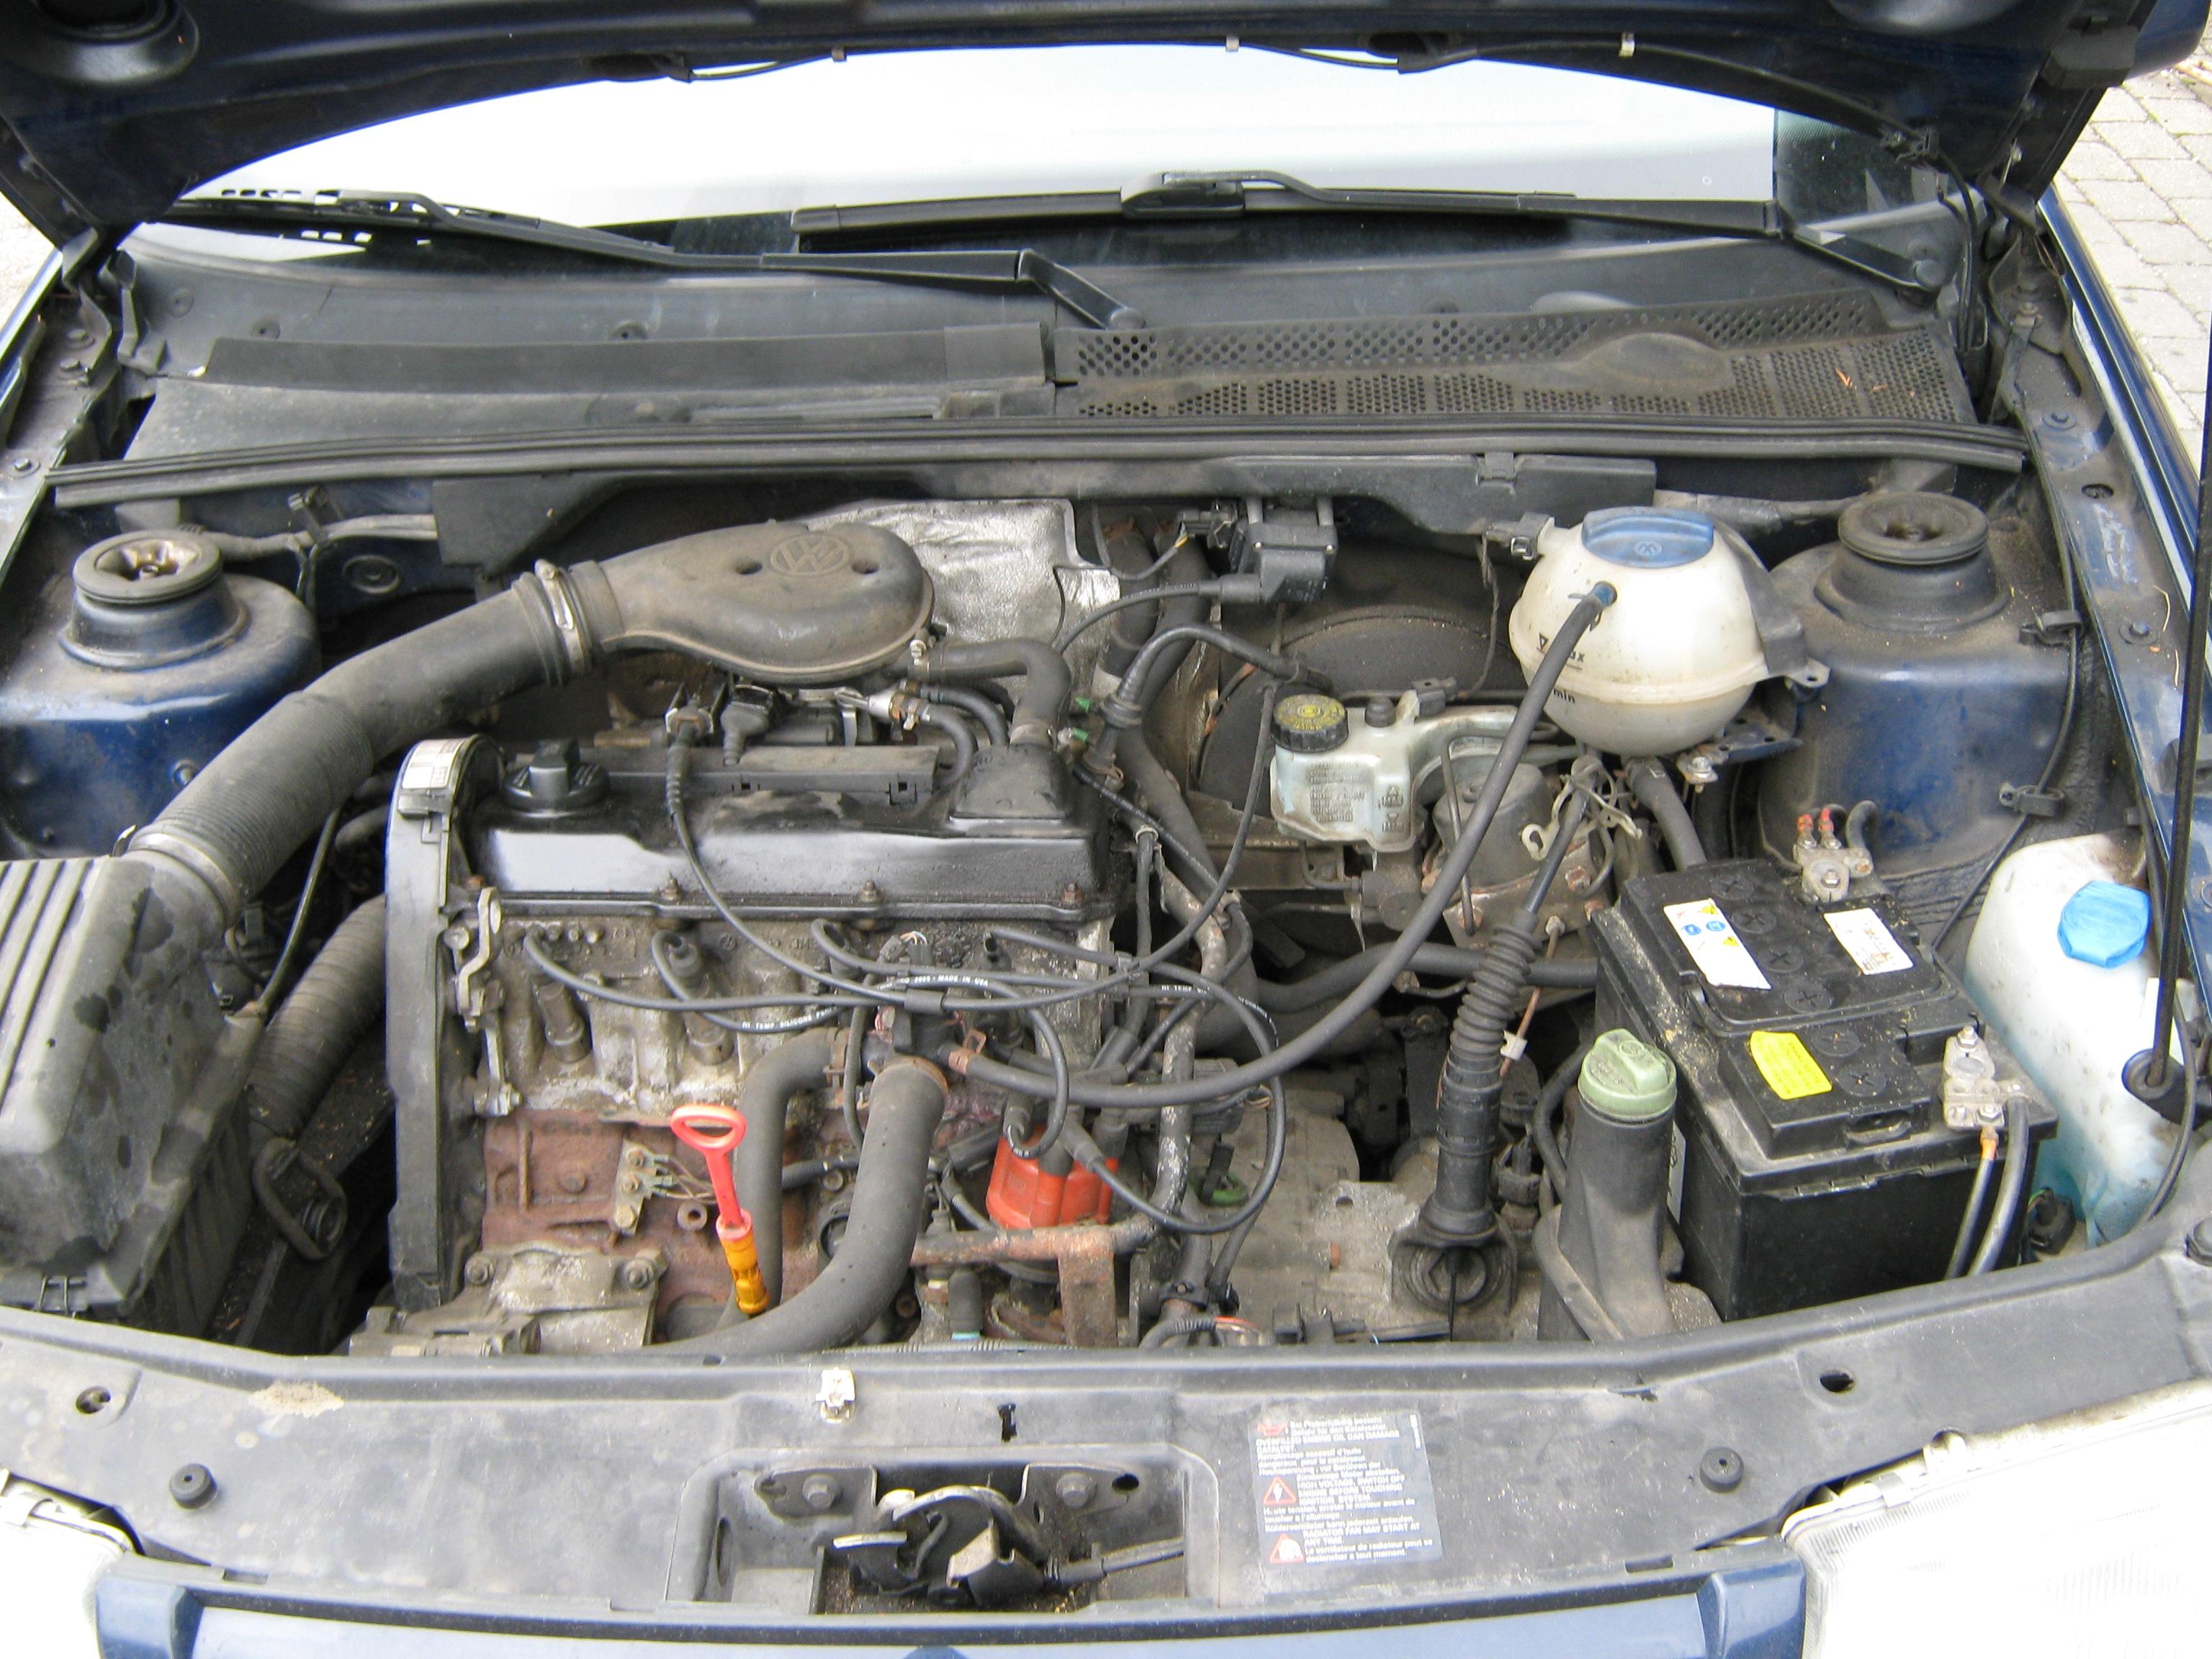 90 mazda miata engine diagram mazda miata engine diagram